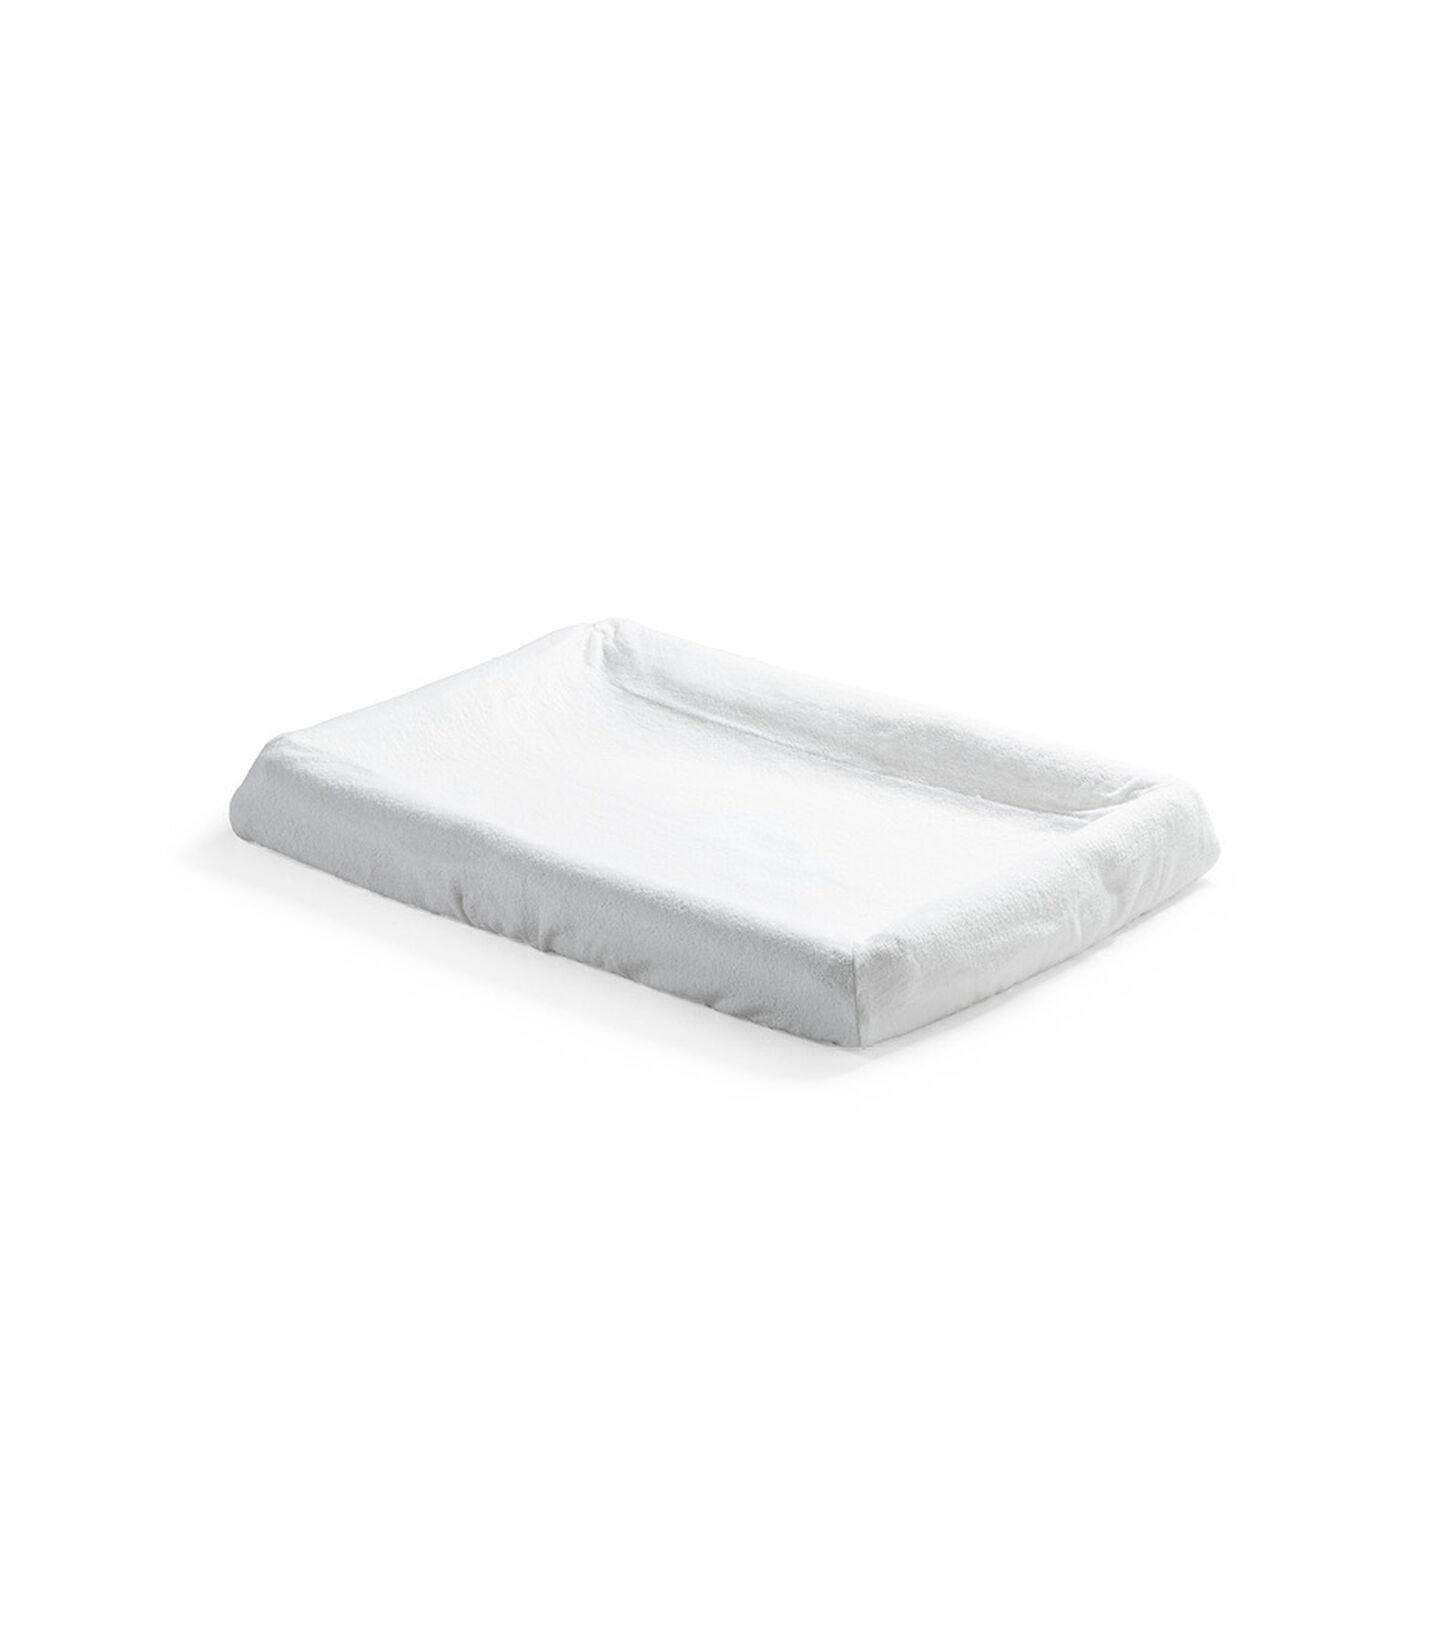 Stokke® Home™ Cambiador Funda Colchón 2p Blanco, , mainview view 1